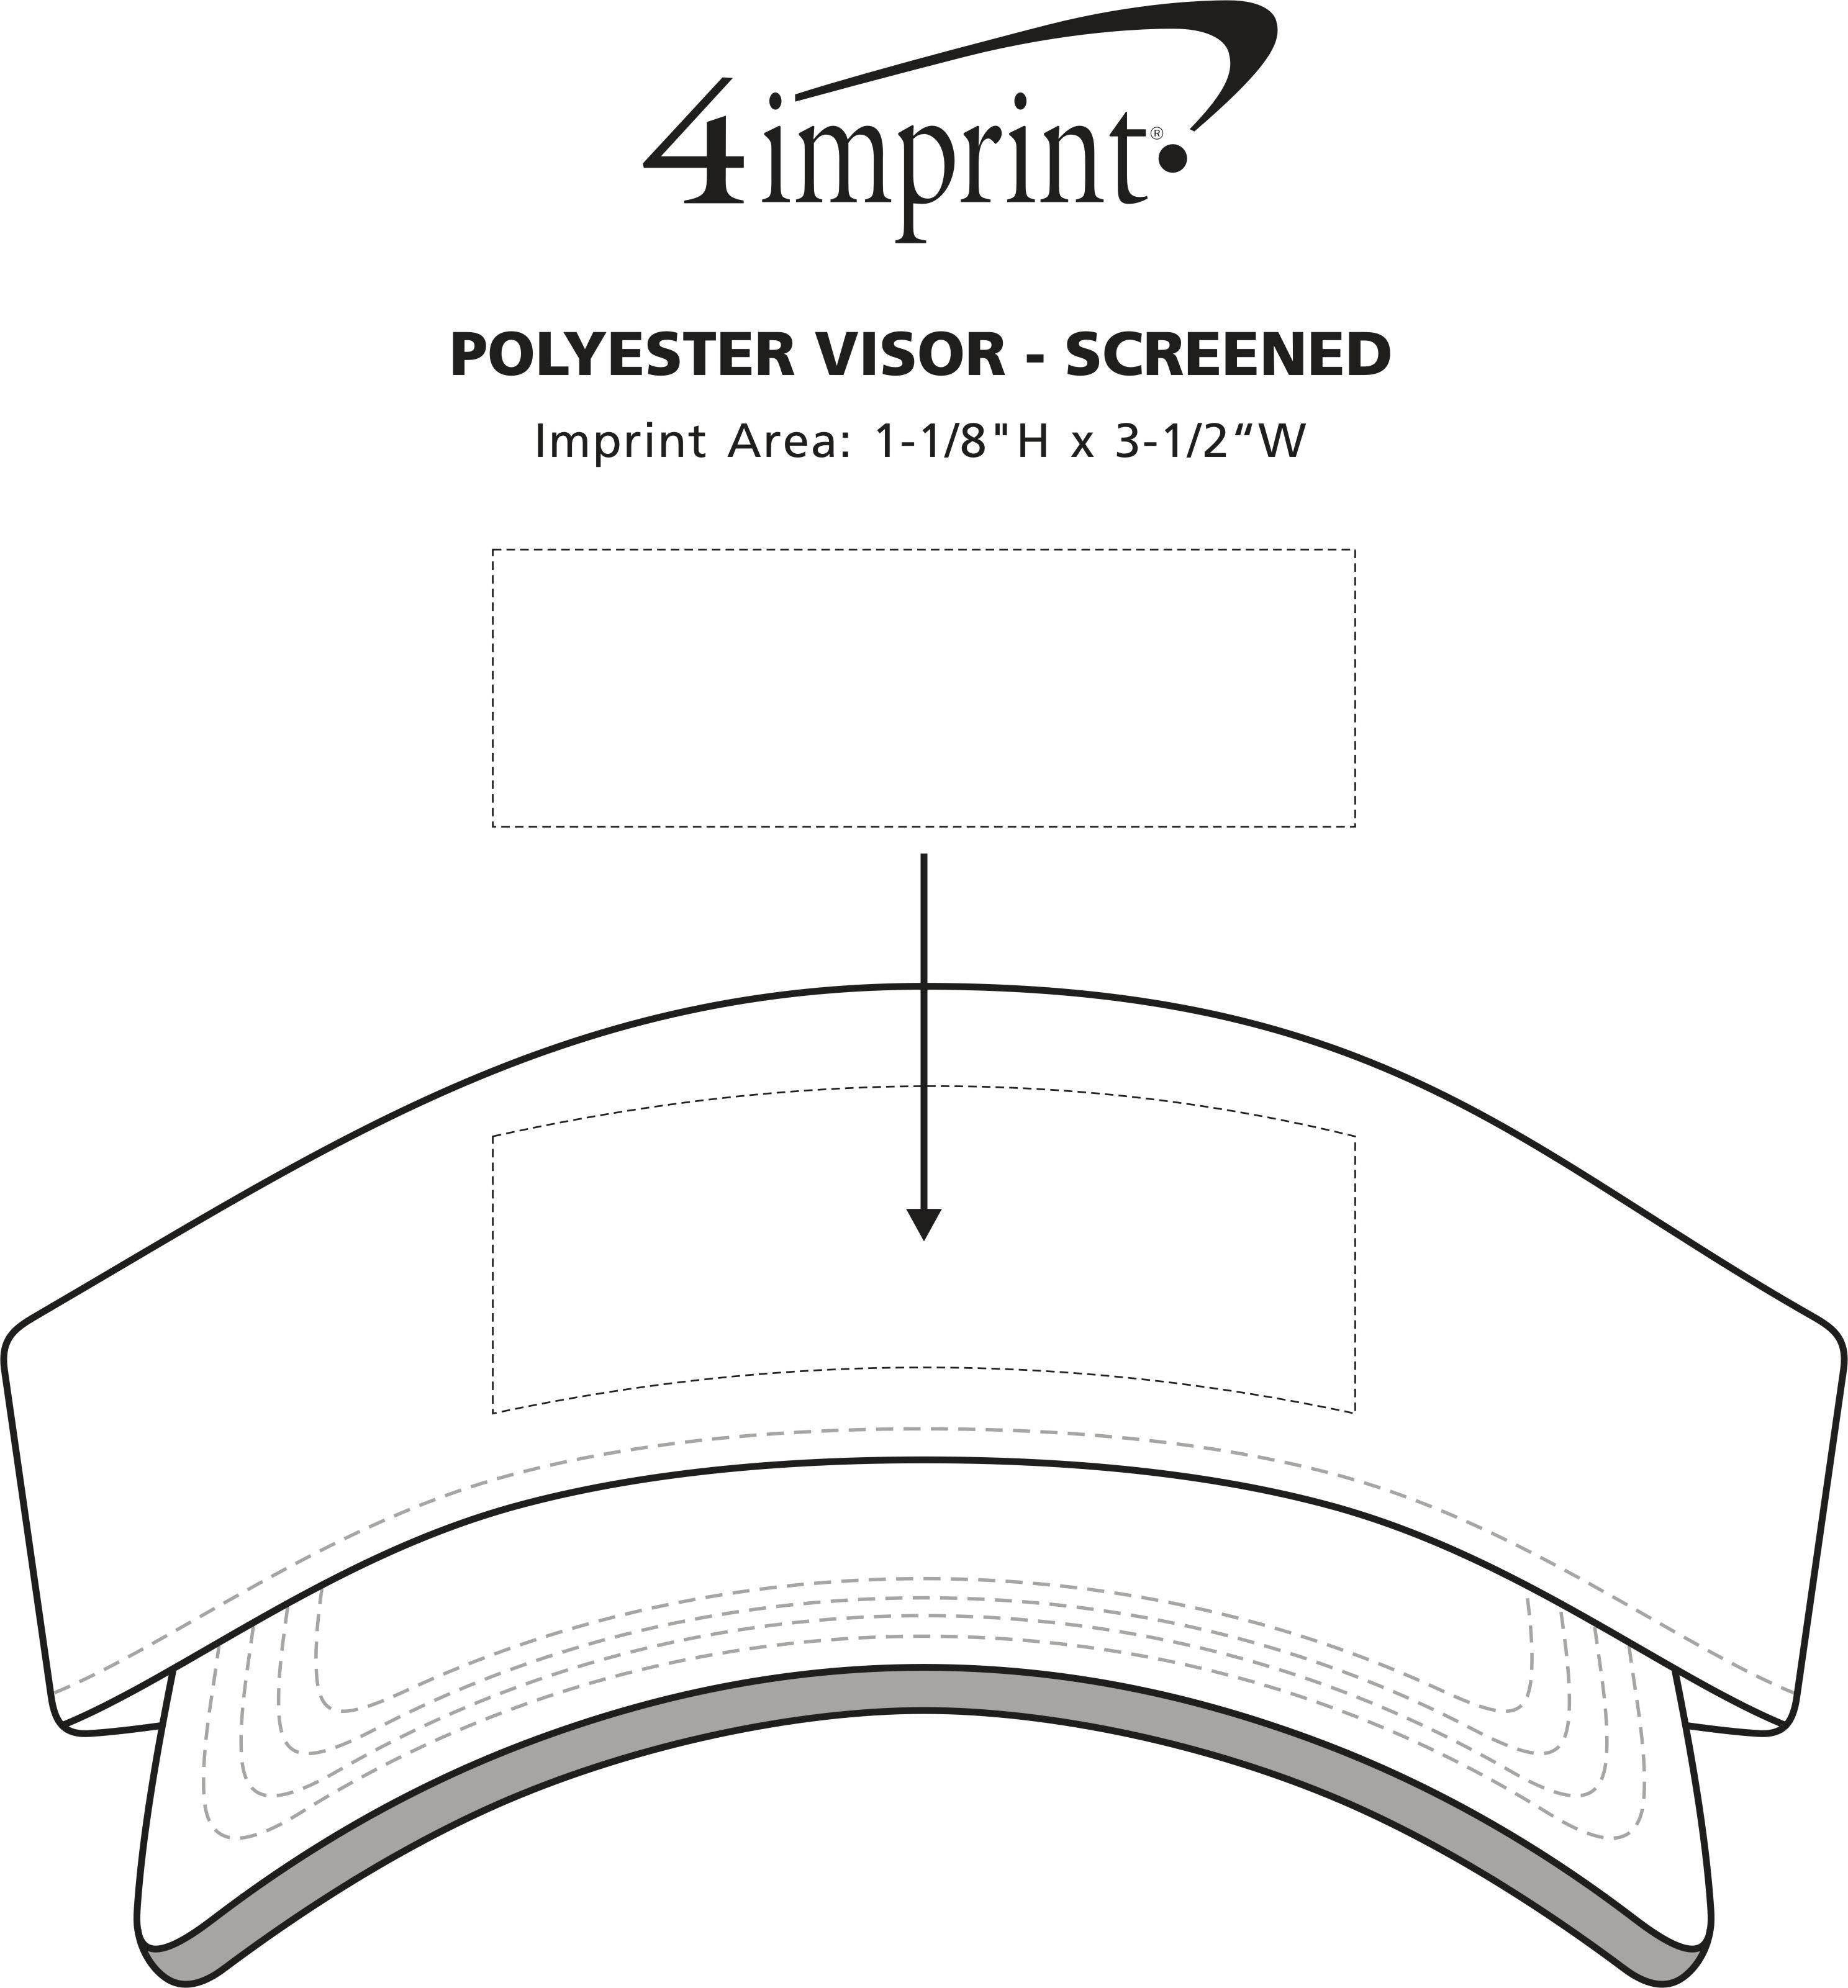 Imprint Area of Polyester Visor - Screen